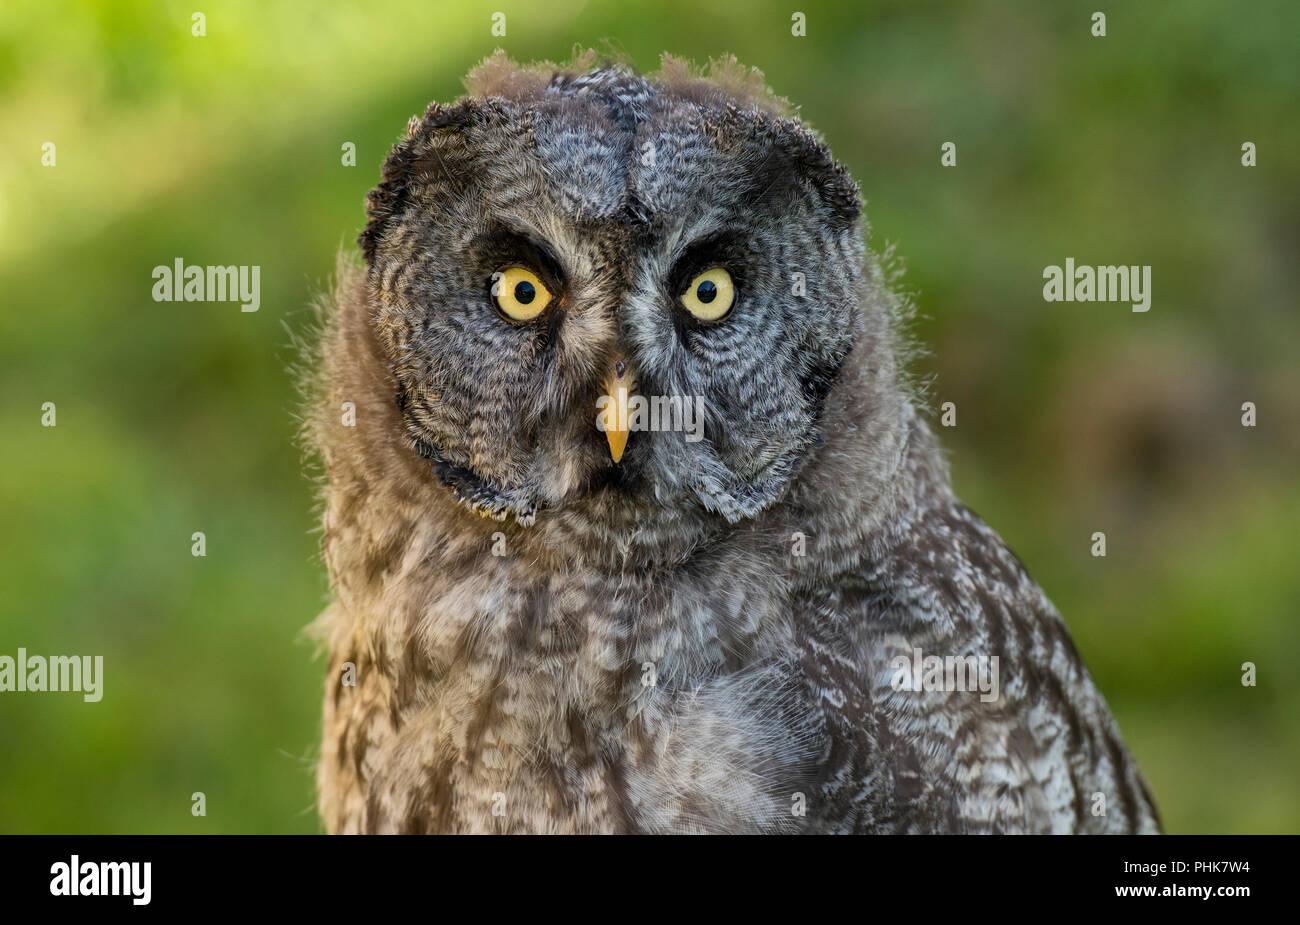 Great Grey Owl Diurnal Owl Yellow Eyes Day Time Hunter